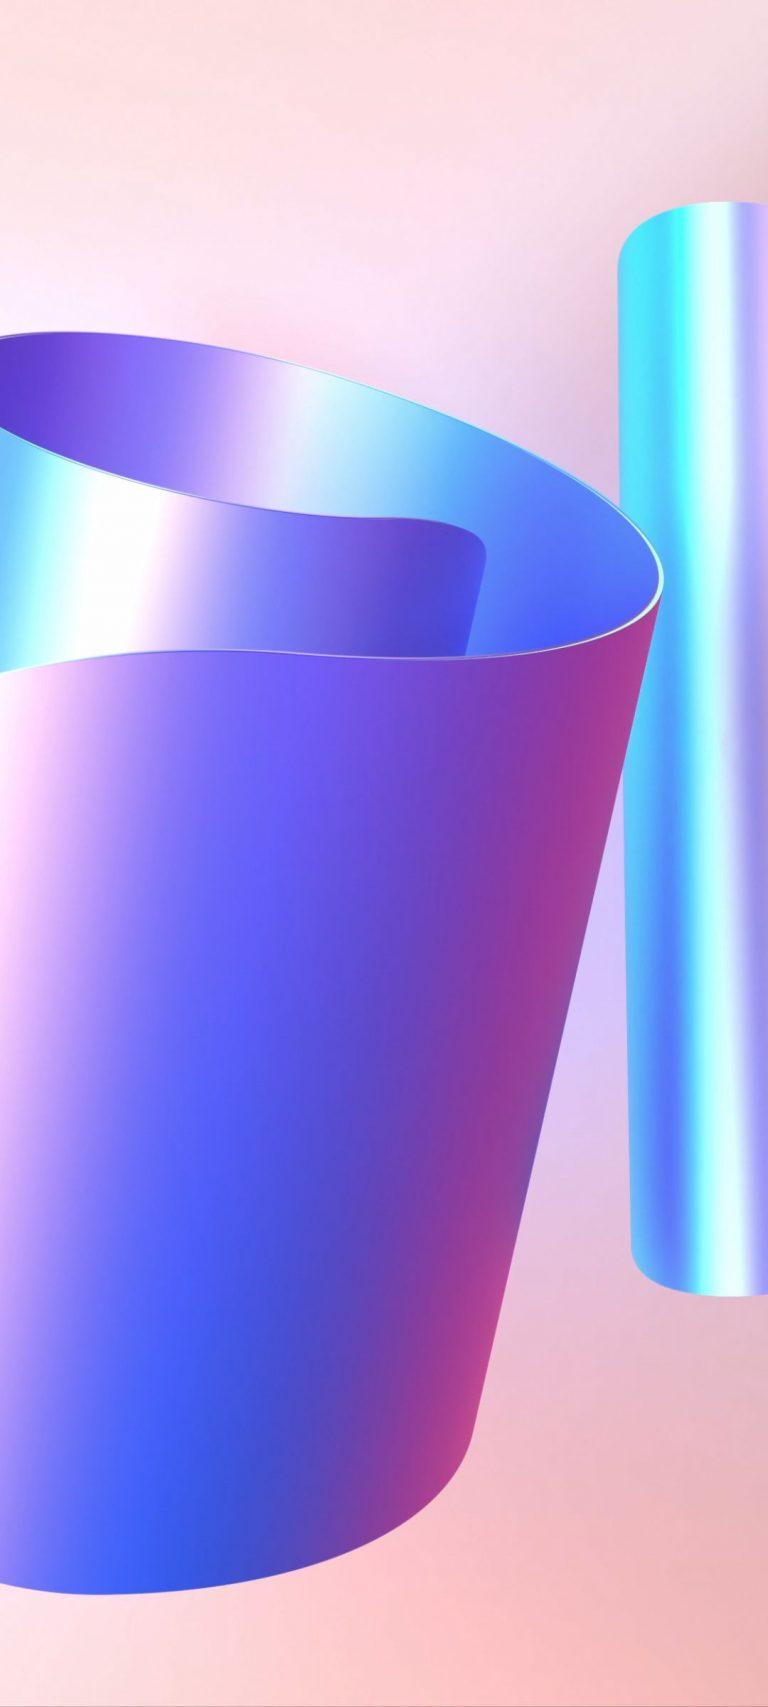 OnePlus 8T Stock Wallpaper - 06